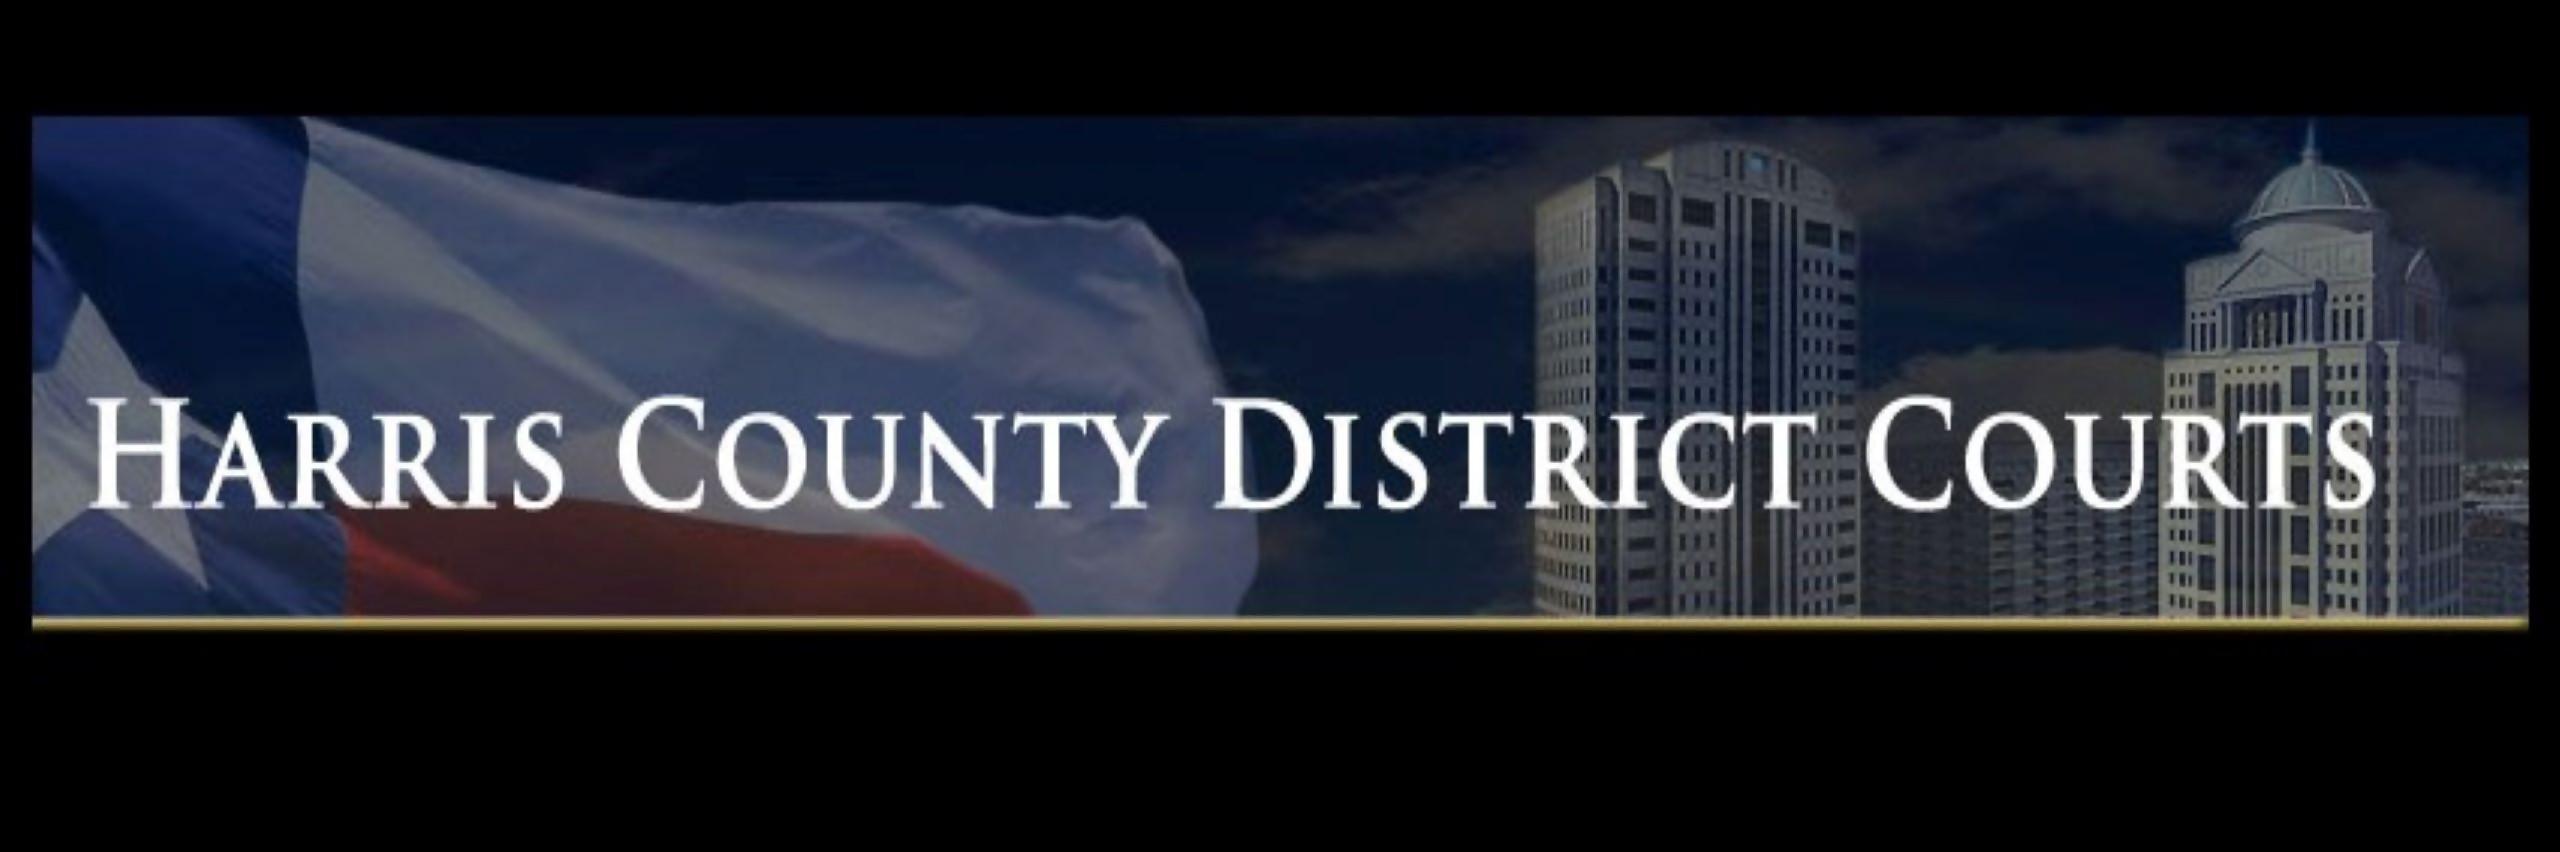 248th District Court - Live Stream